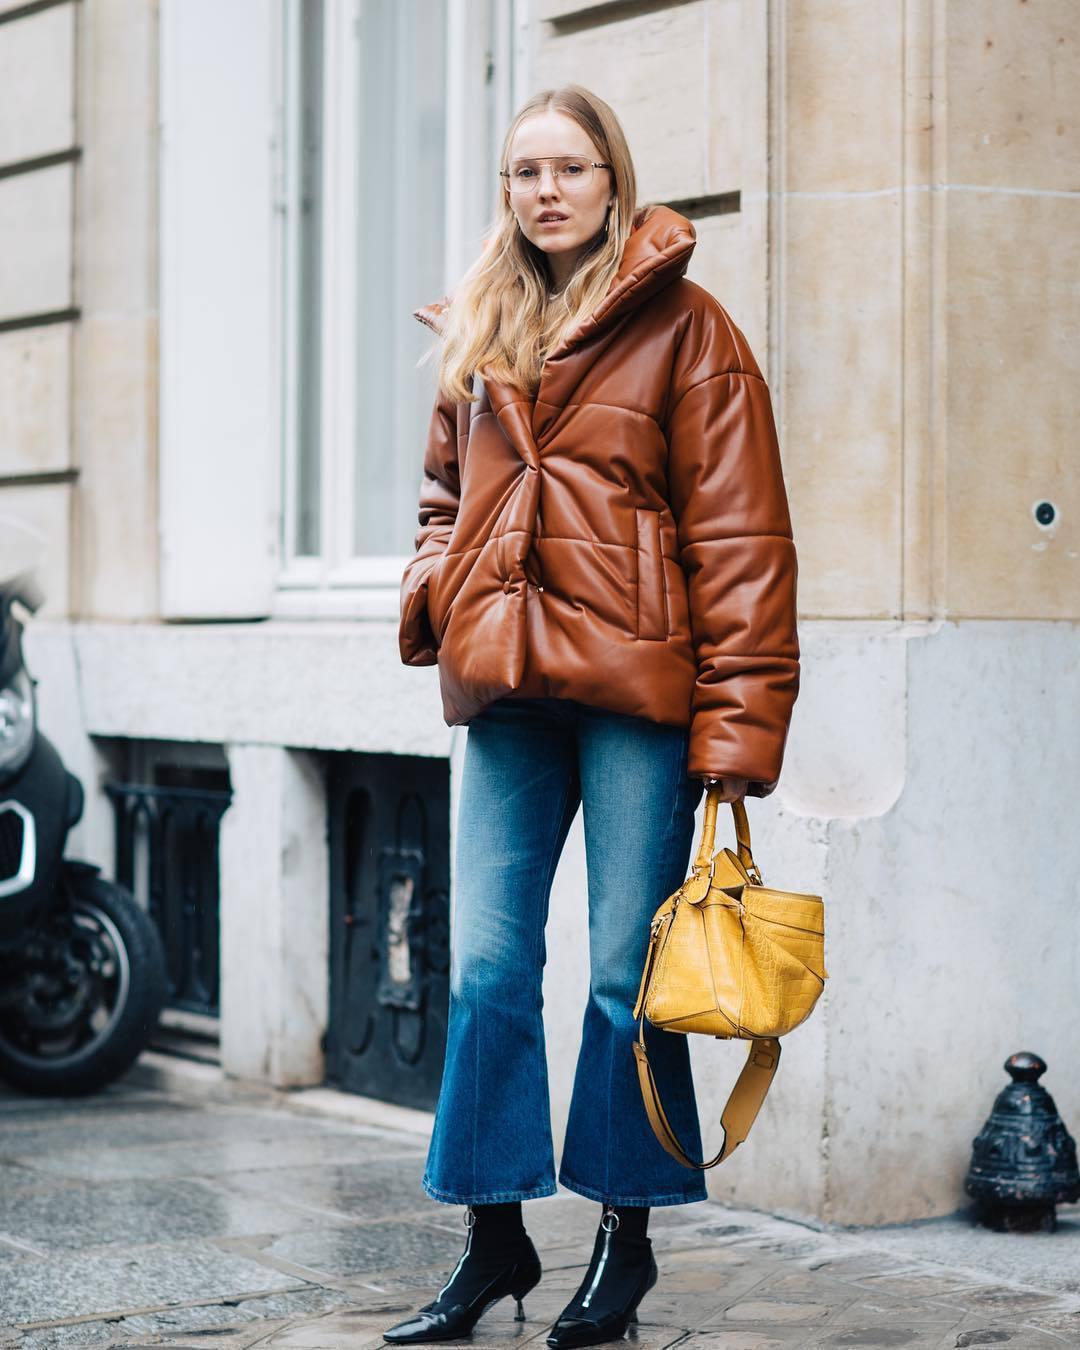 jacket puffer jacket brown jacket flare jeans ankle boots yellow bag shoulder bag